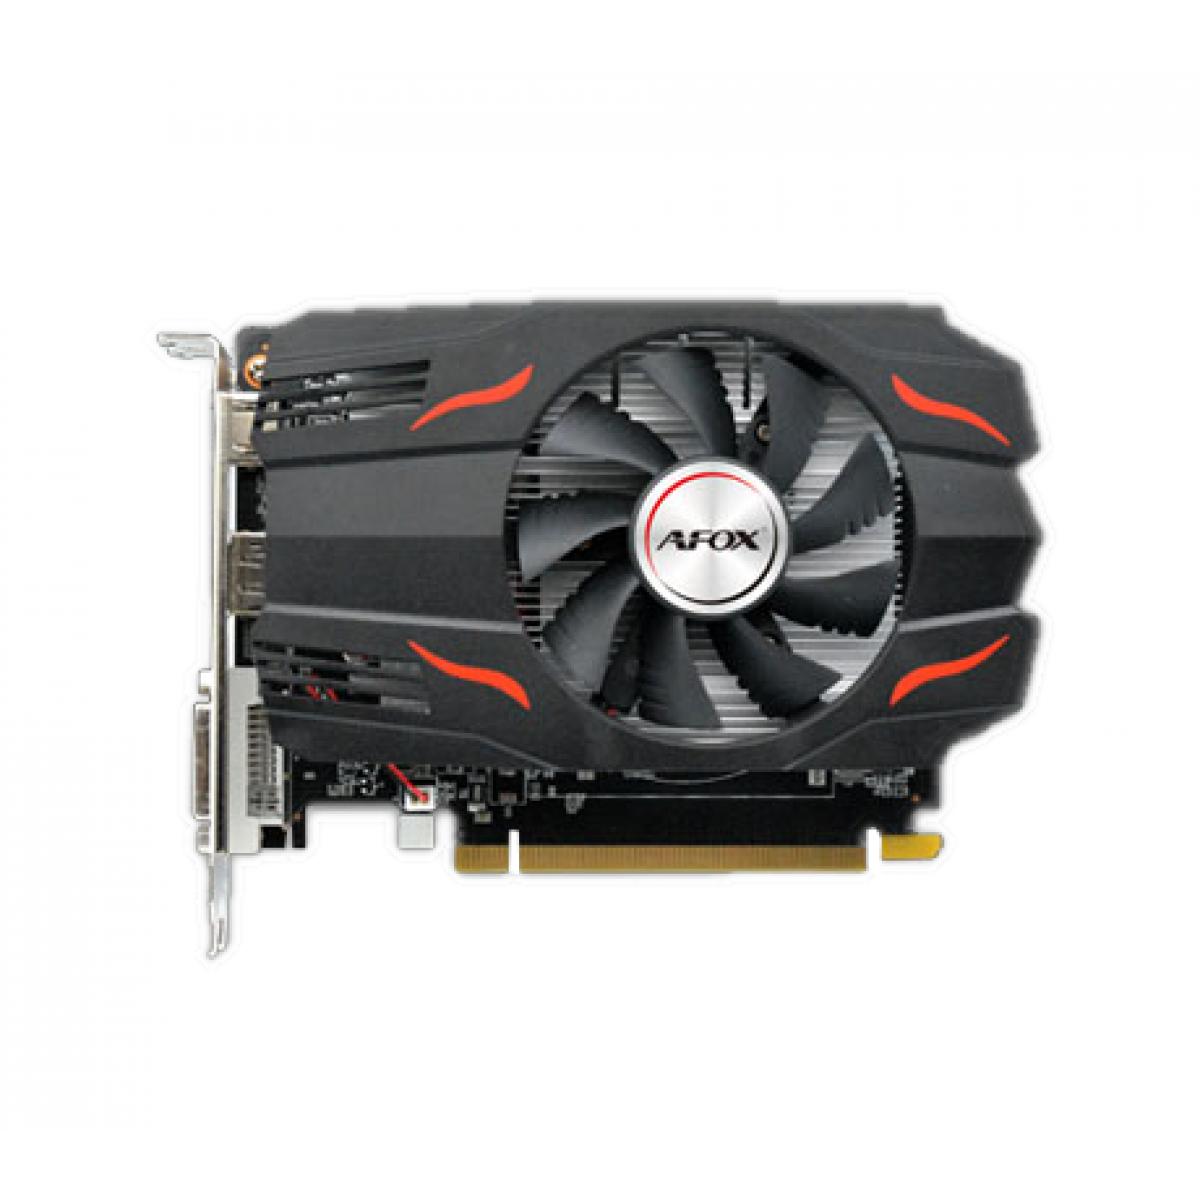 Placa de Vídeo Afox, Radeon, RX 550, 2GB, GDDR5, 128Bit, AFRX550-2048D5H4 - Open Box